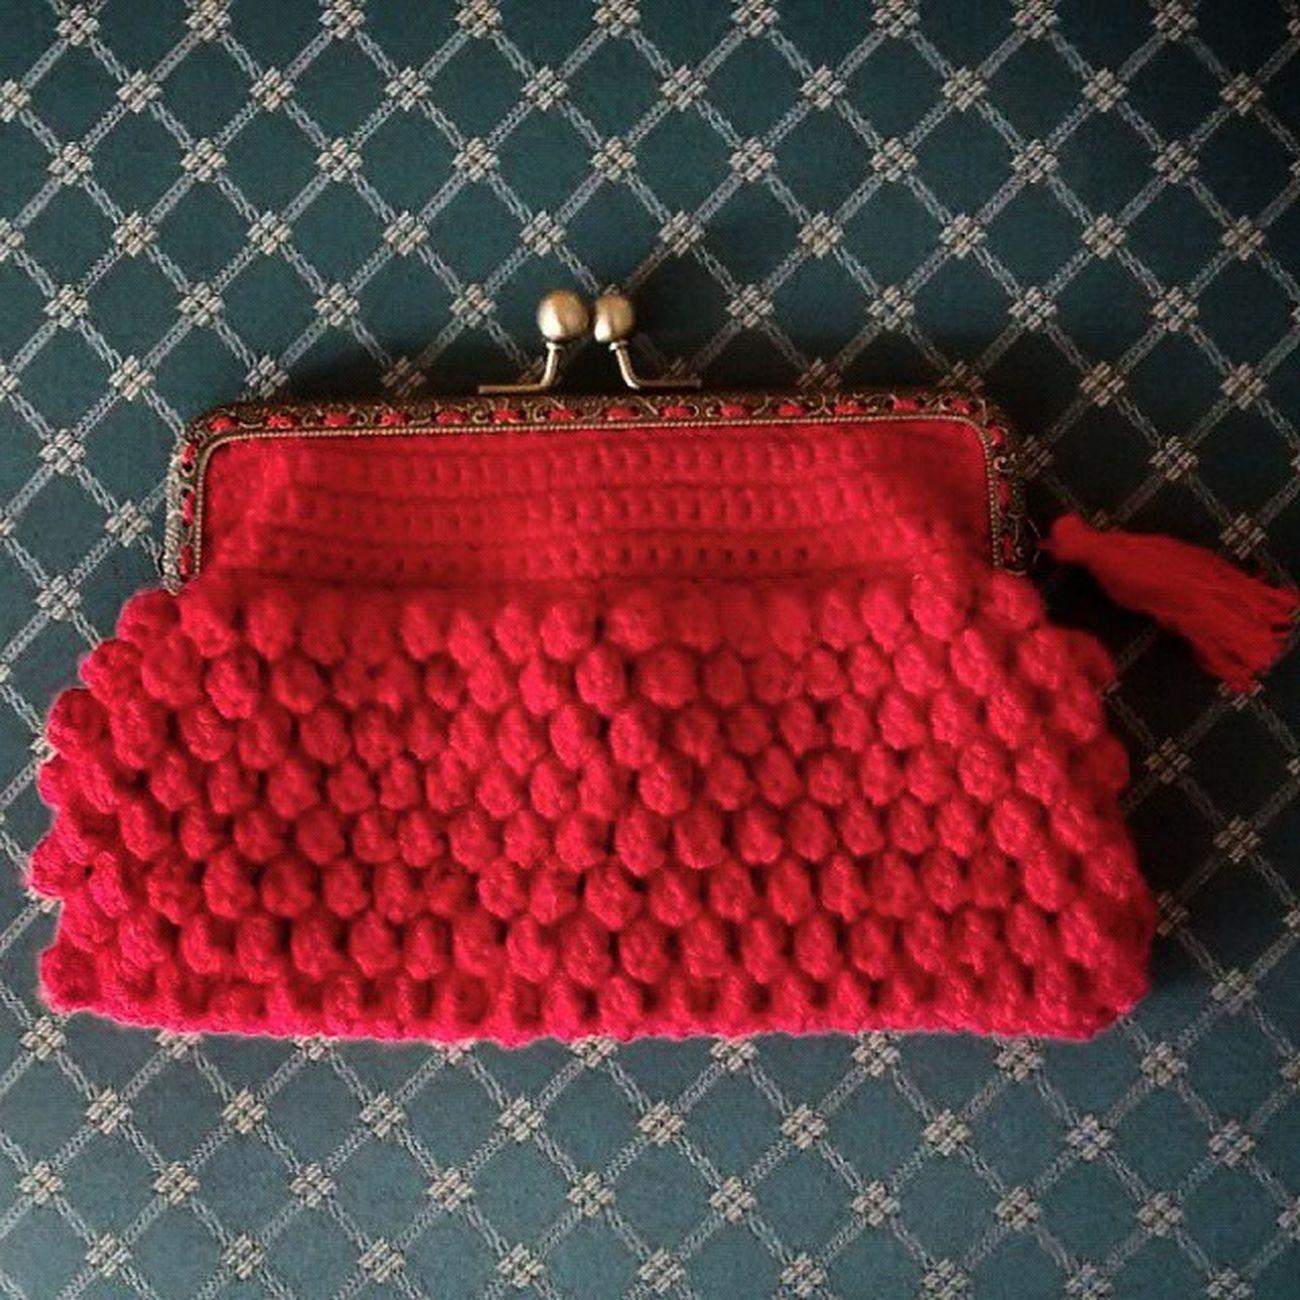 Finiquitado!! Coinpurse Monedero Popcornstich Crochet Ganchillo Yarn Red Handmade Handmadewithlove